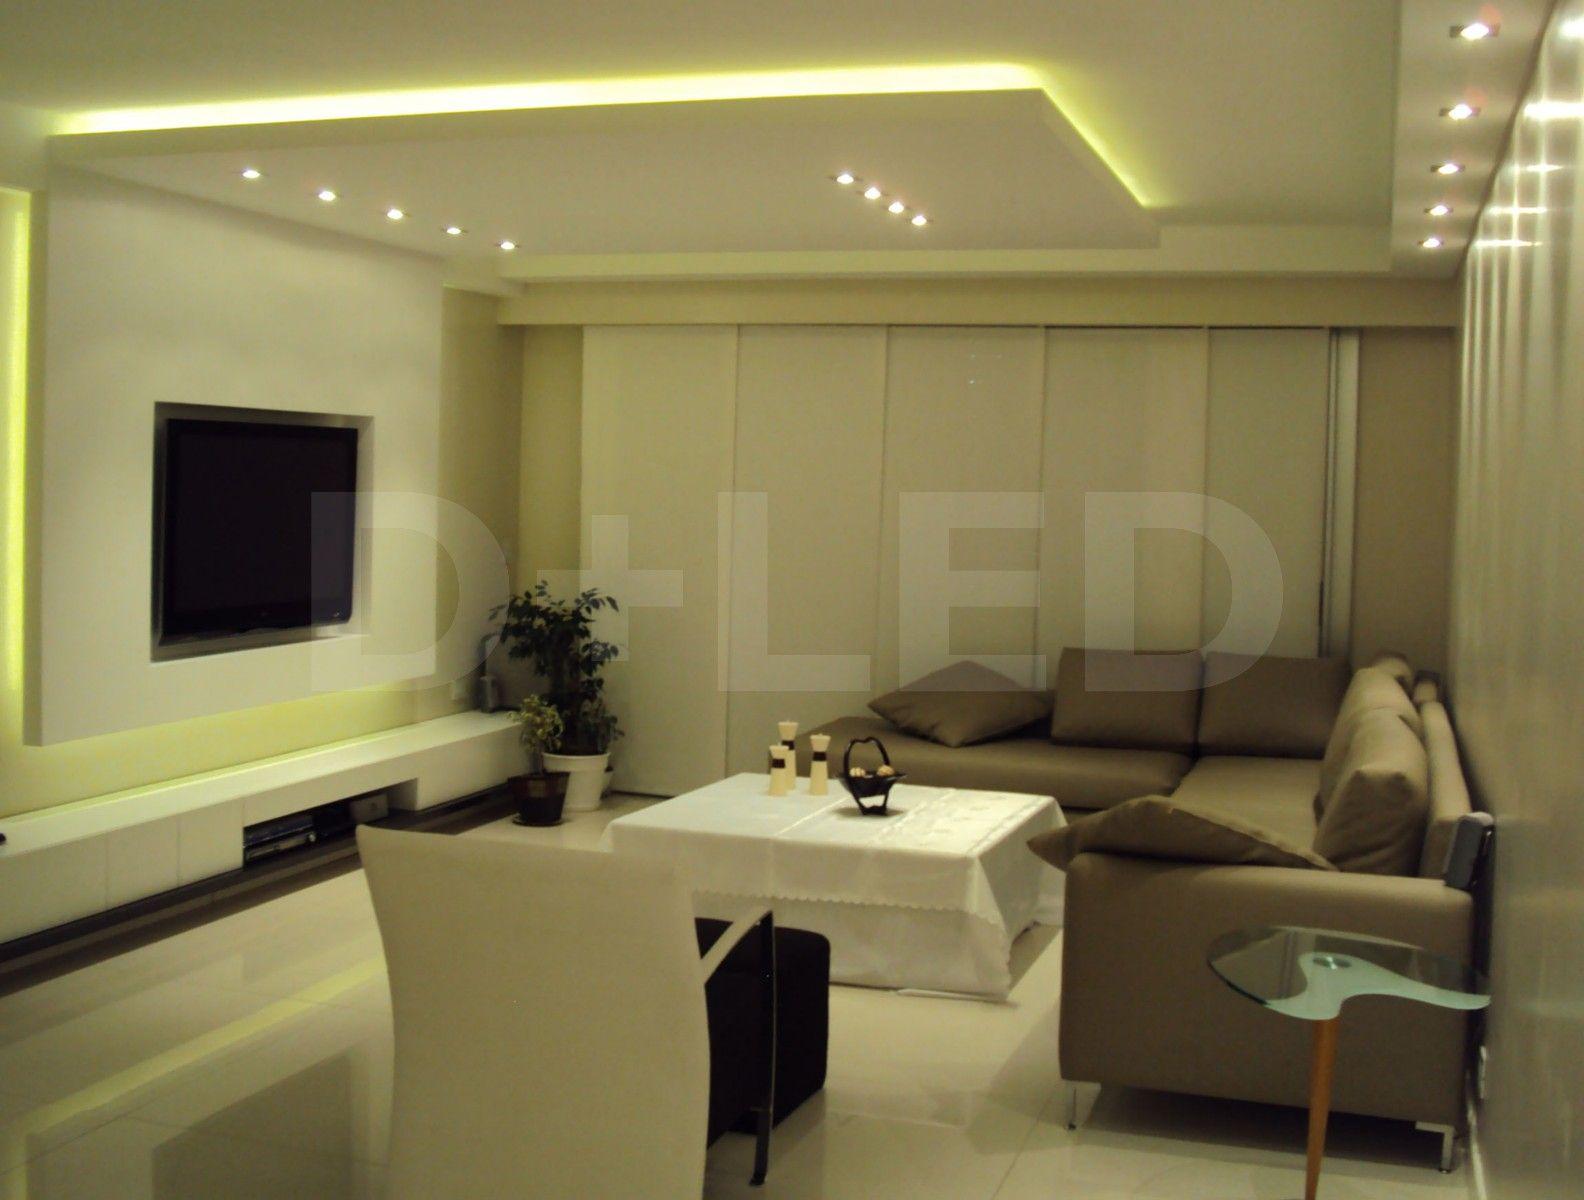 Aplicaciones de leds en demasled ilumina tus ideas - Iluminacion led para el hogar ...